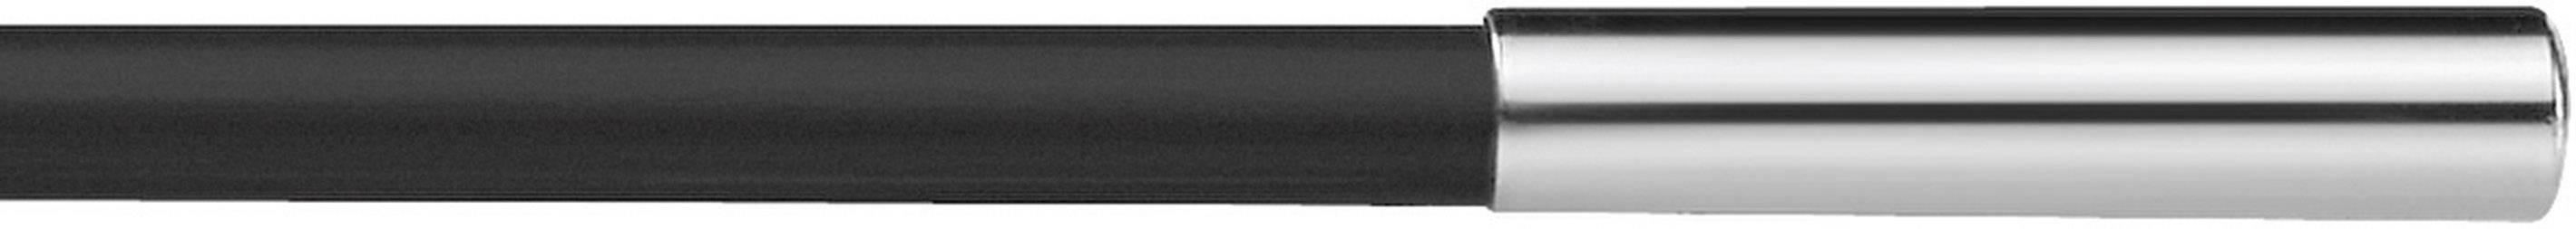 Teplotný senzor Sygonix 38928C, IP68, -20 až 70 °C, čierny